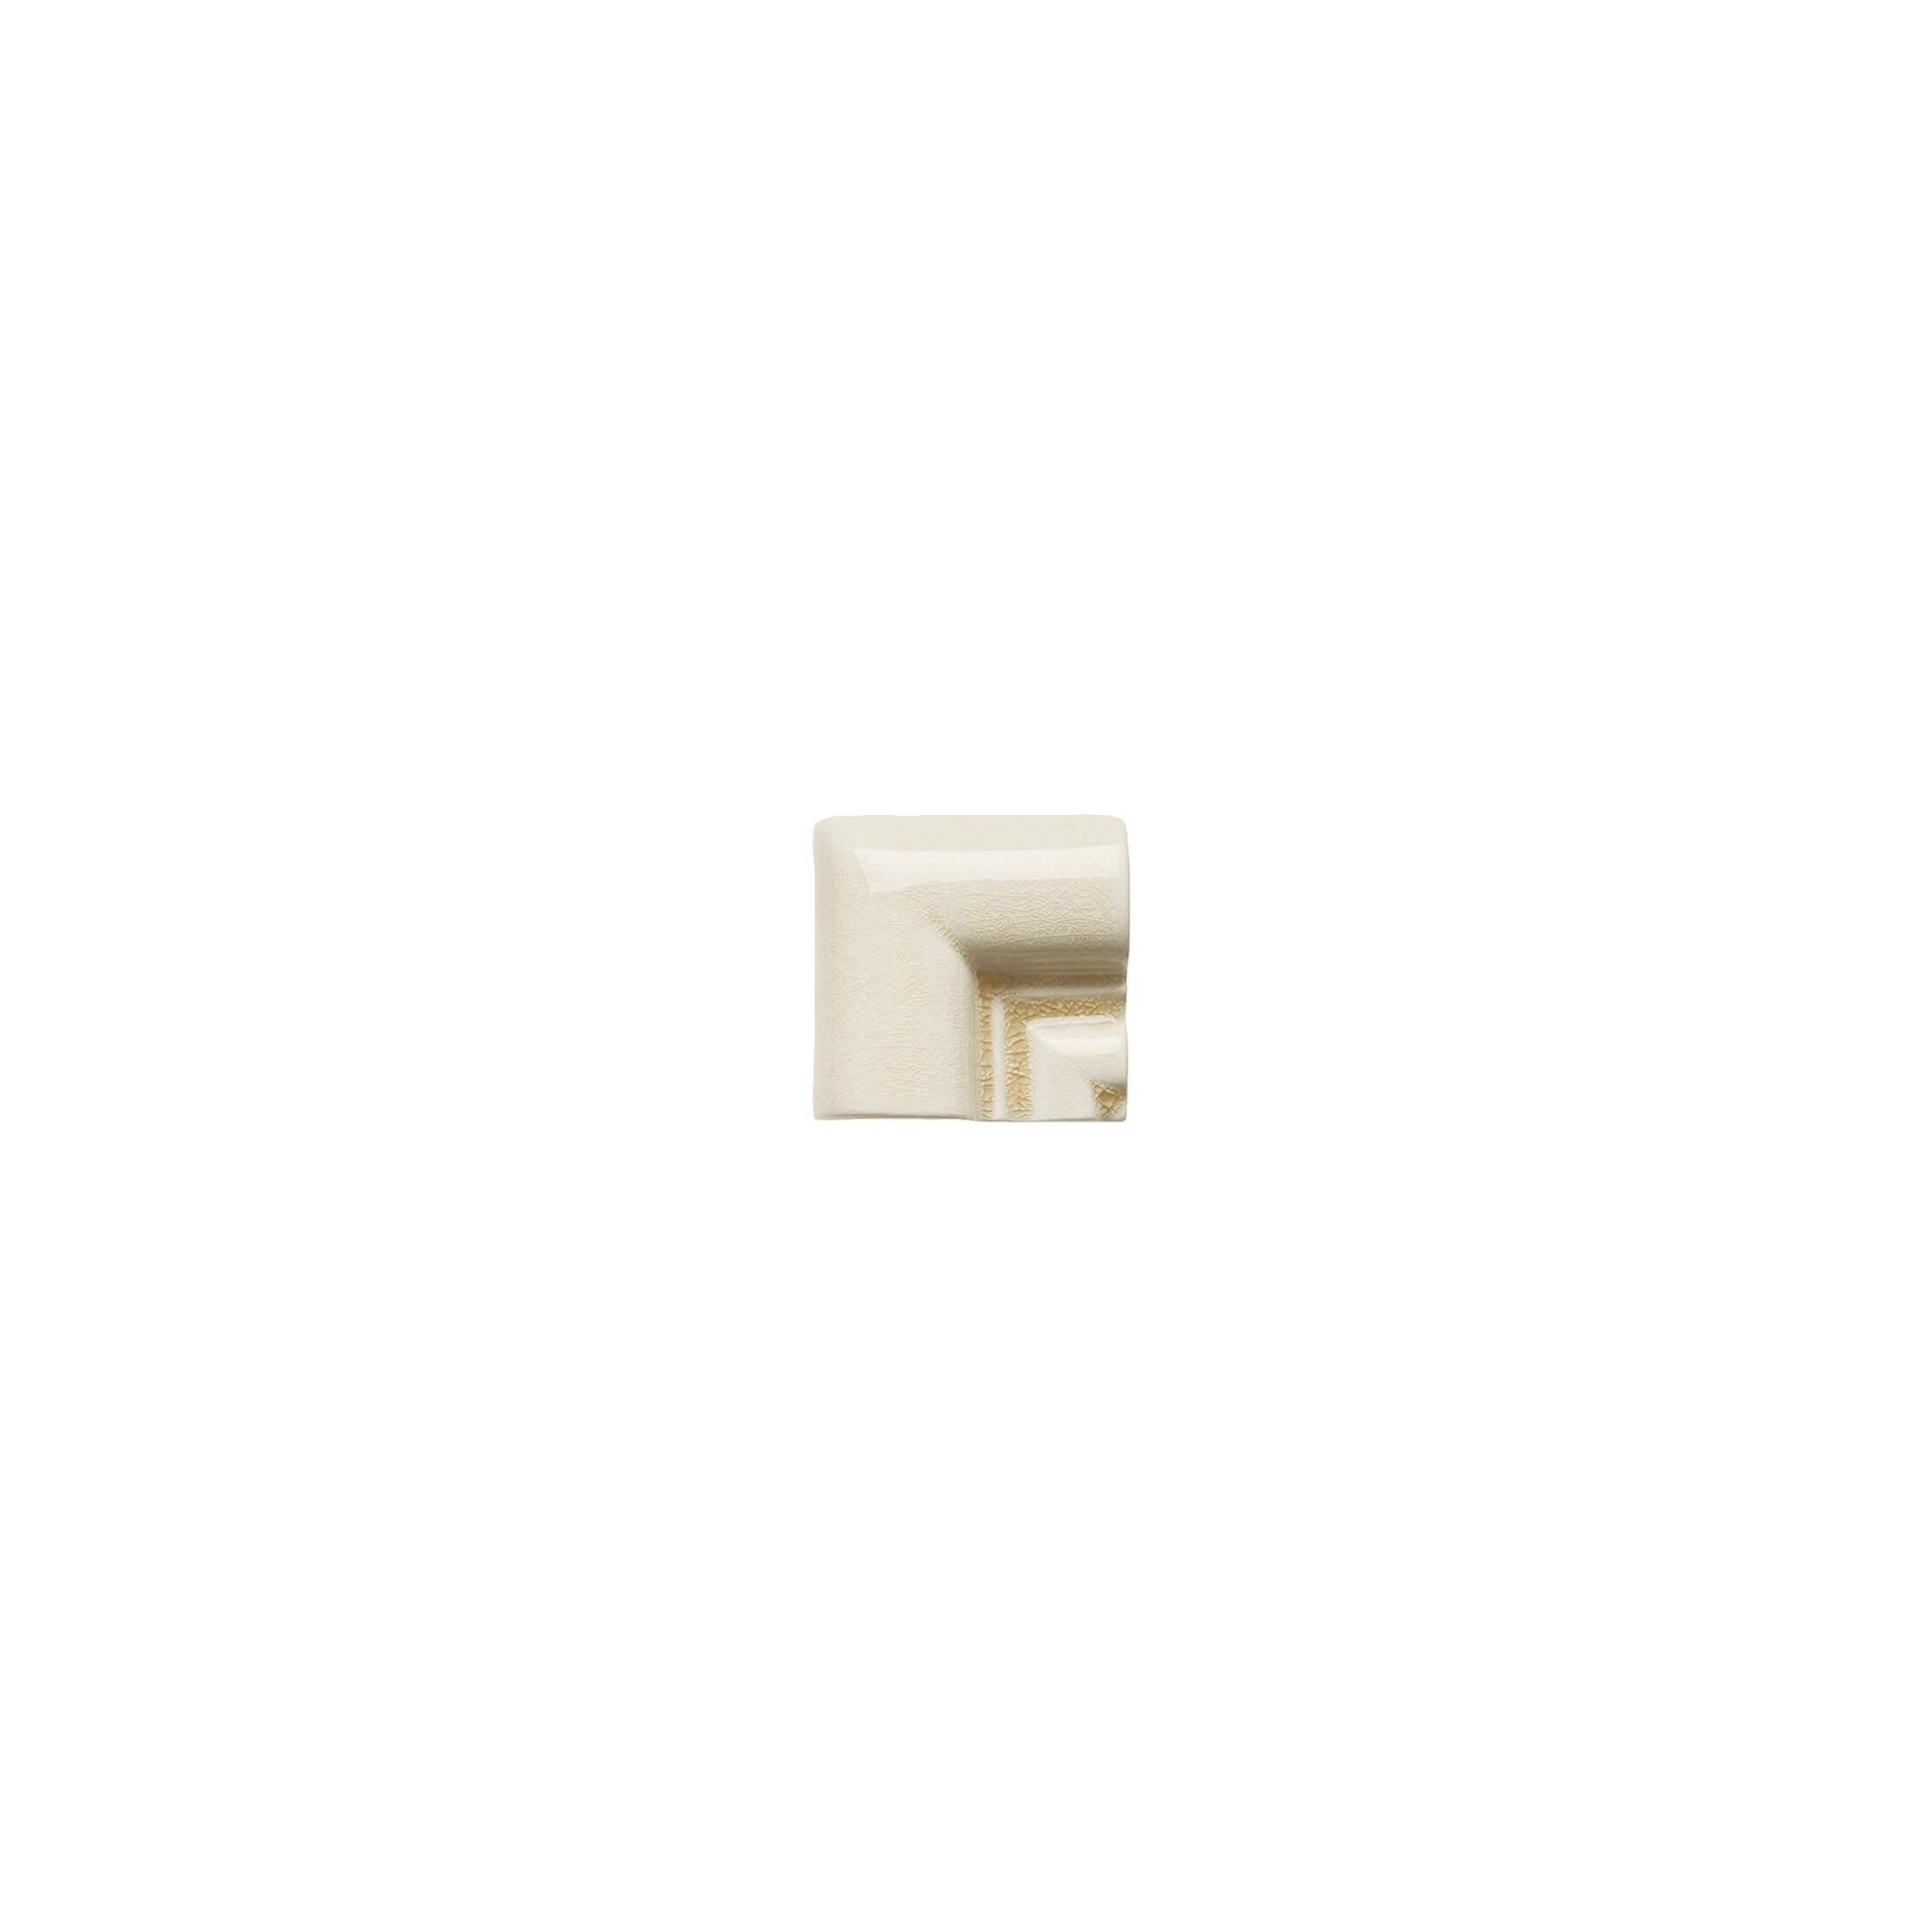 ADOC5081 - ANGULO MARCOMOLDURA - 5 cm X 15 cm